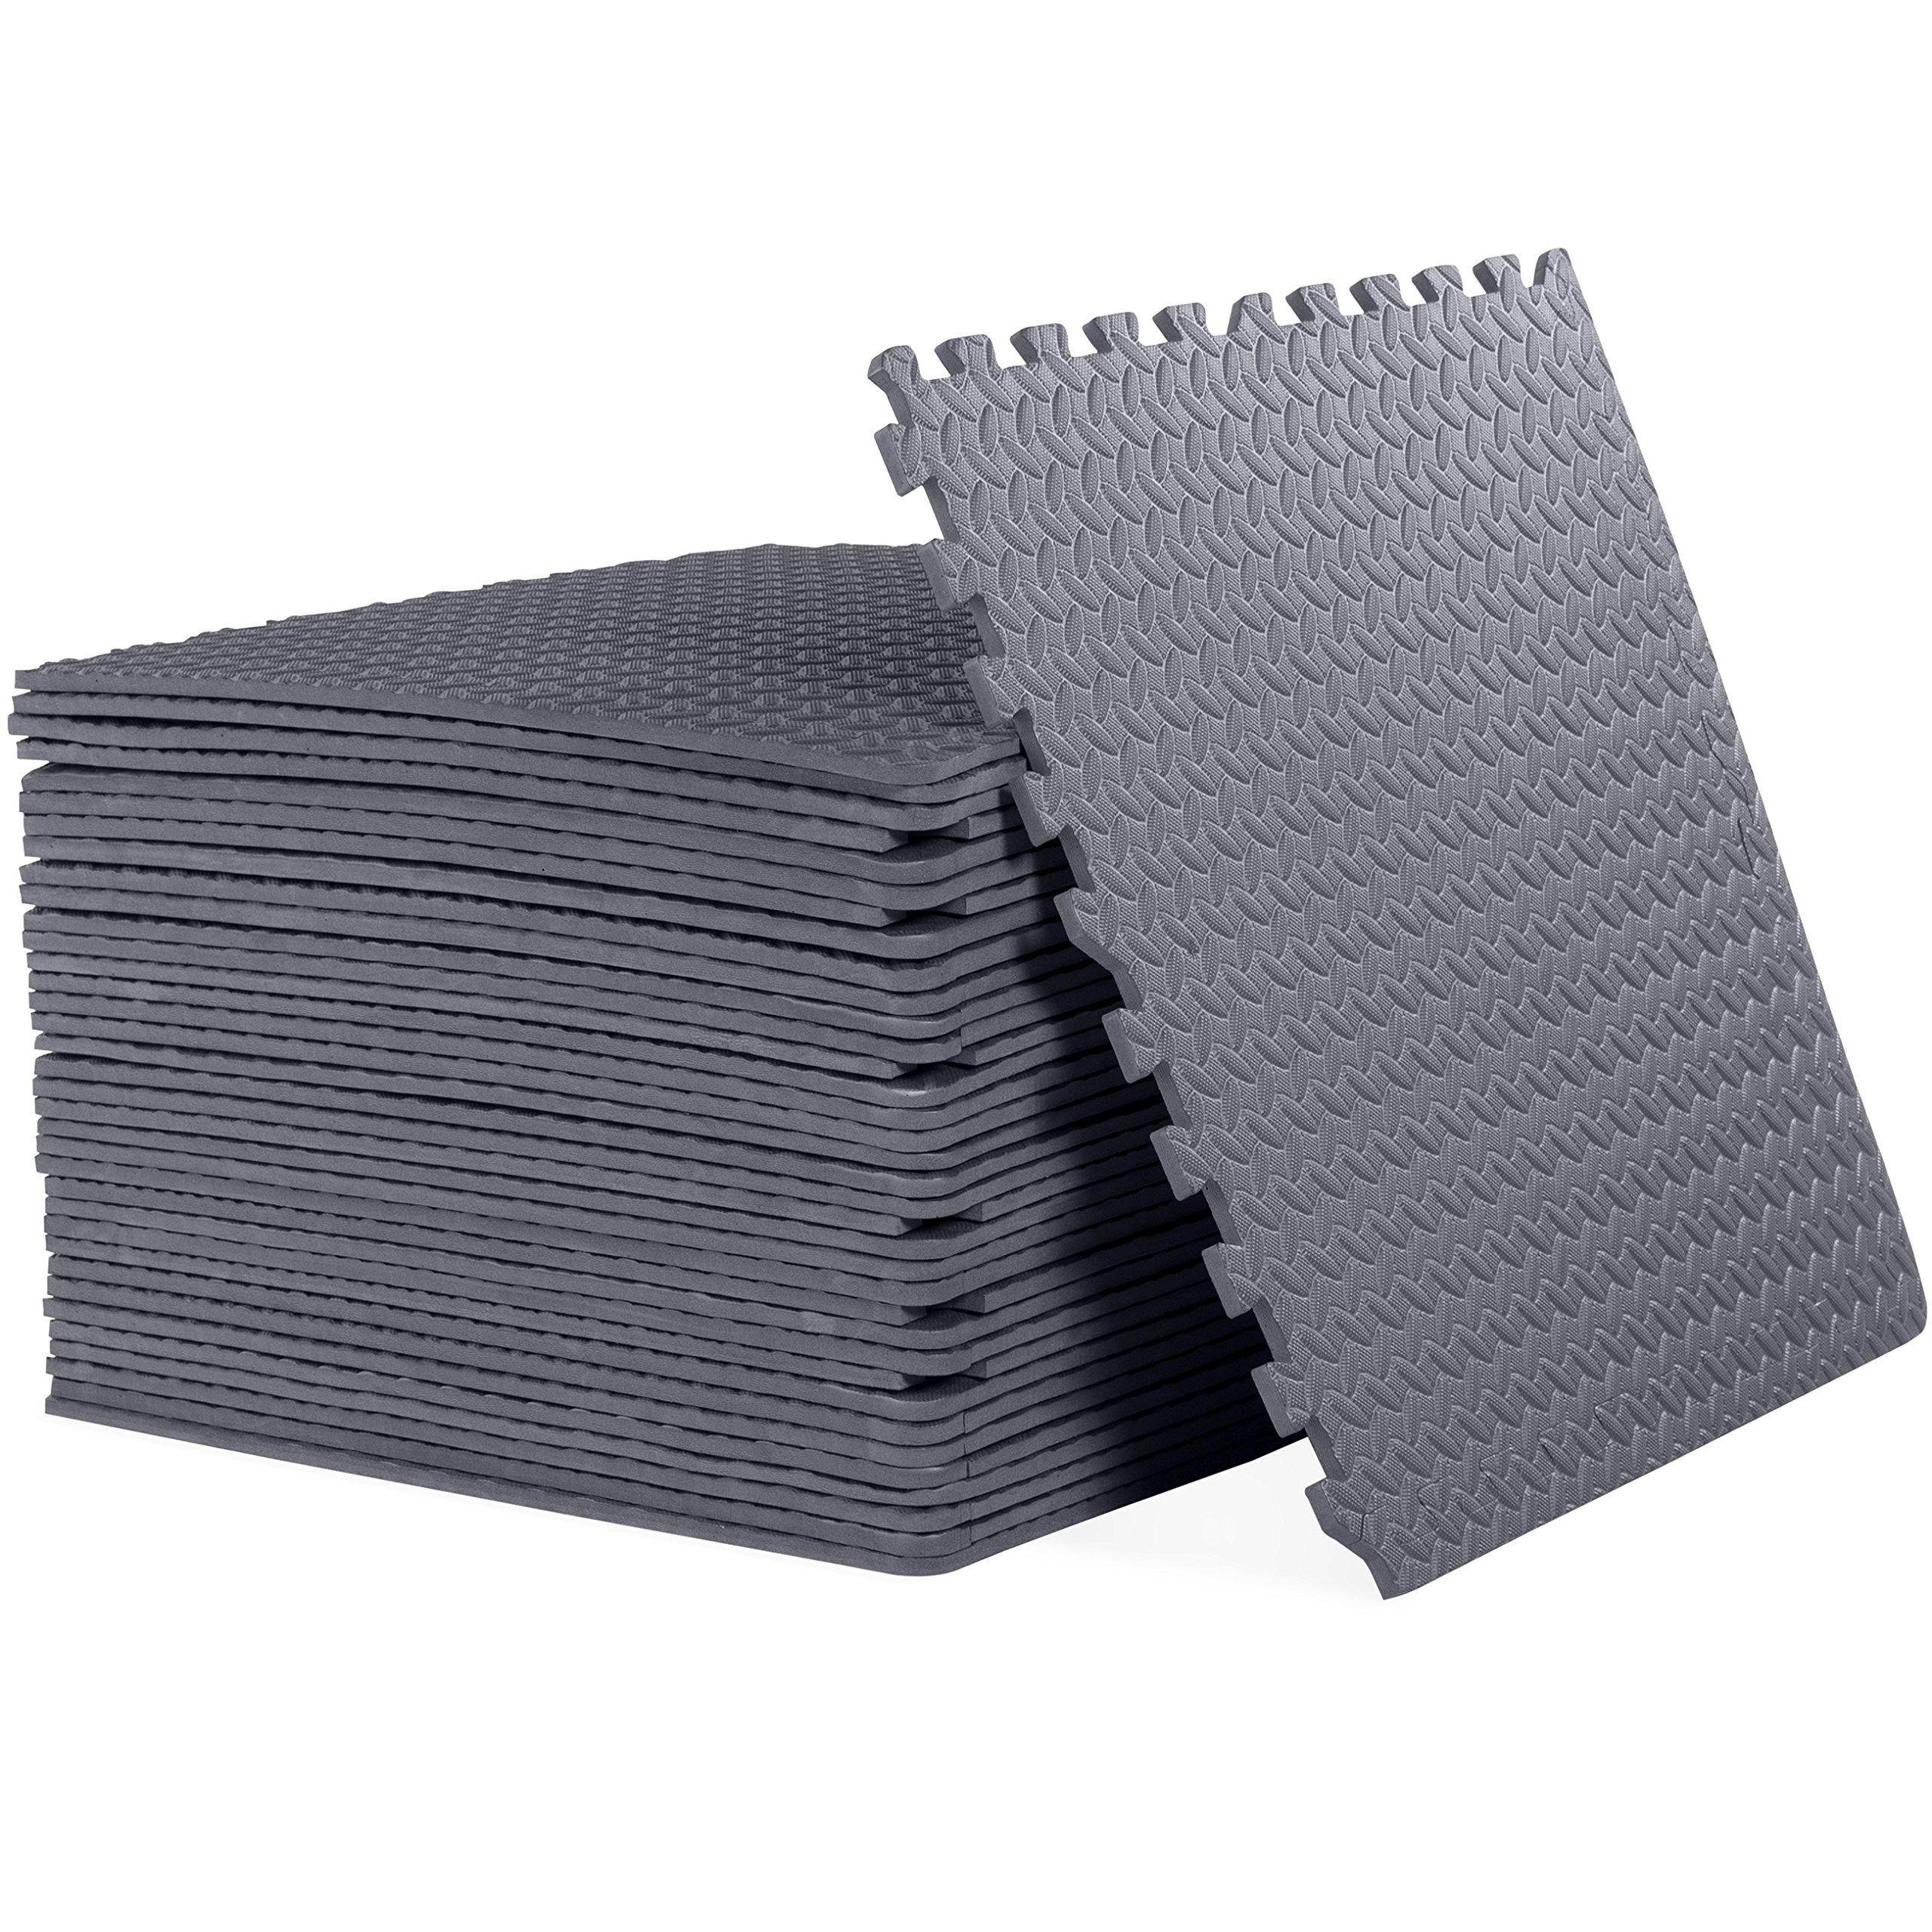 CAP Barbell 1/2'' Puzzle Exercise Mat with EVA Foam Interlocking Tiles, 144 Square Ft (36 Tiles + Borders)